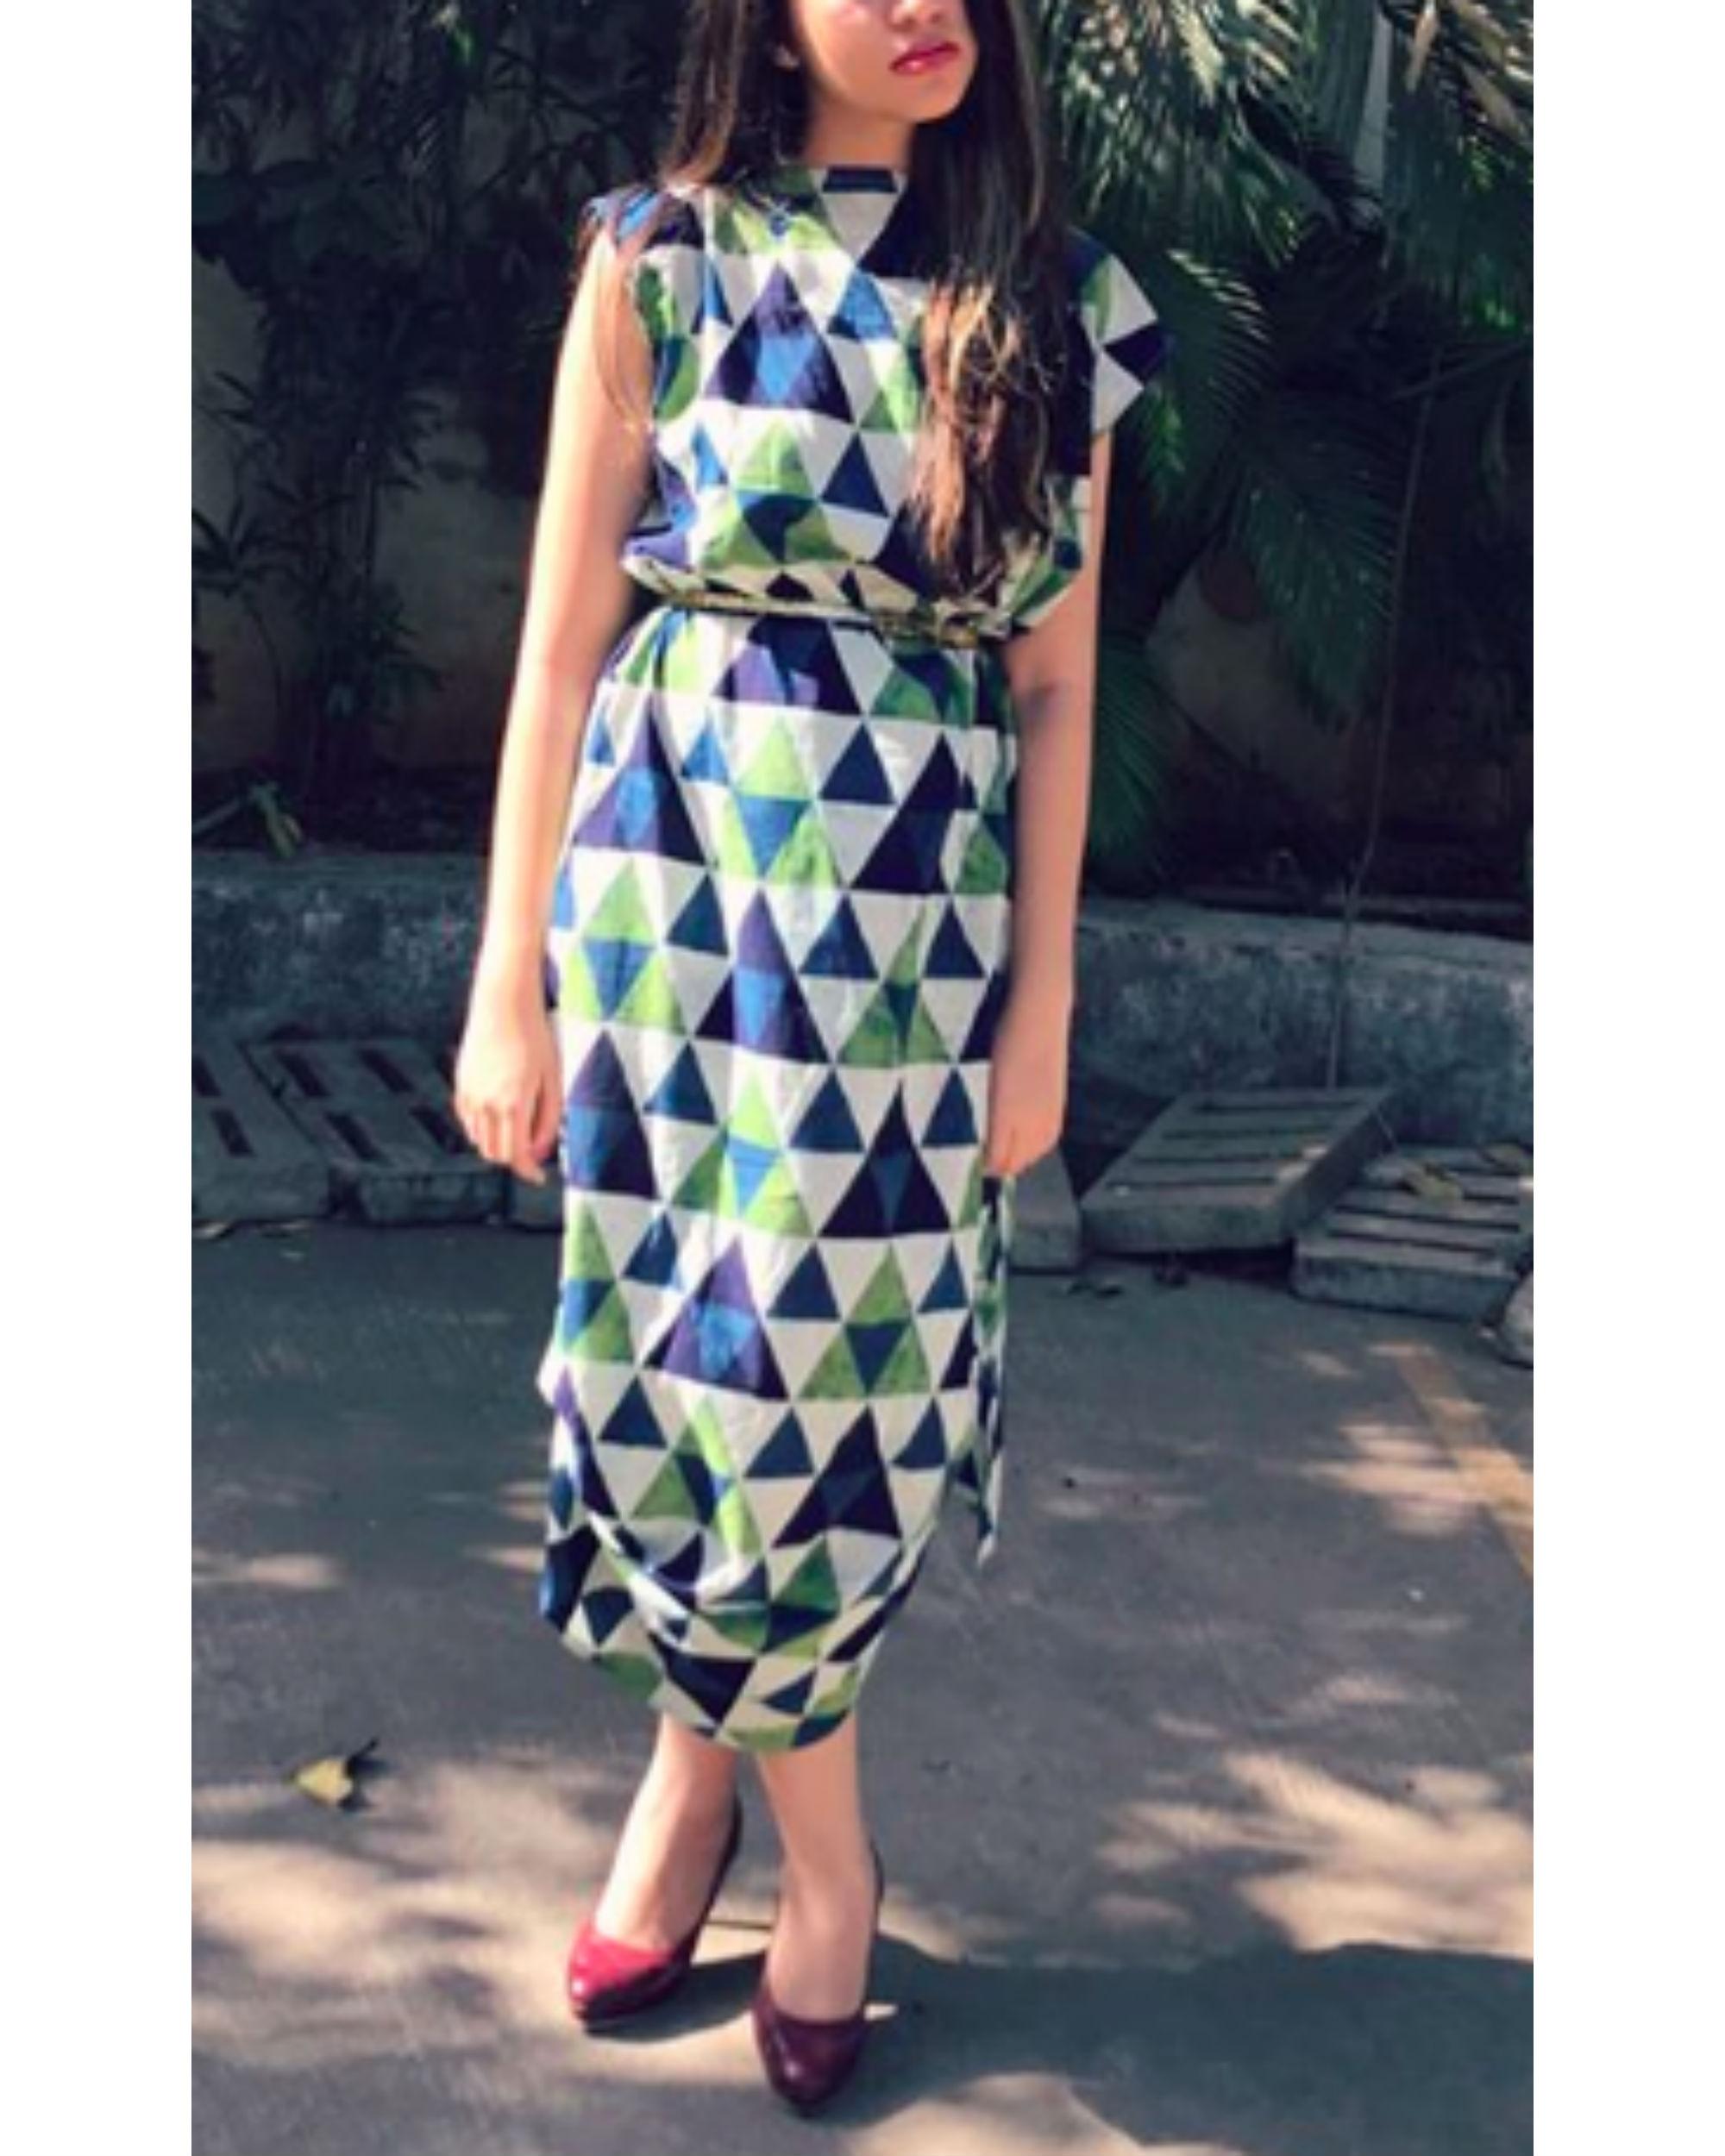 Green and blue mosaic dress